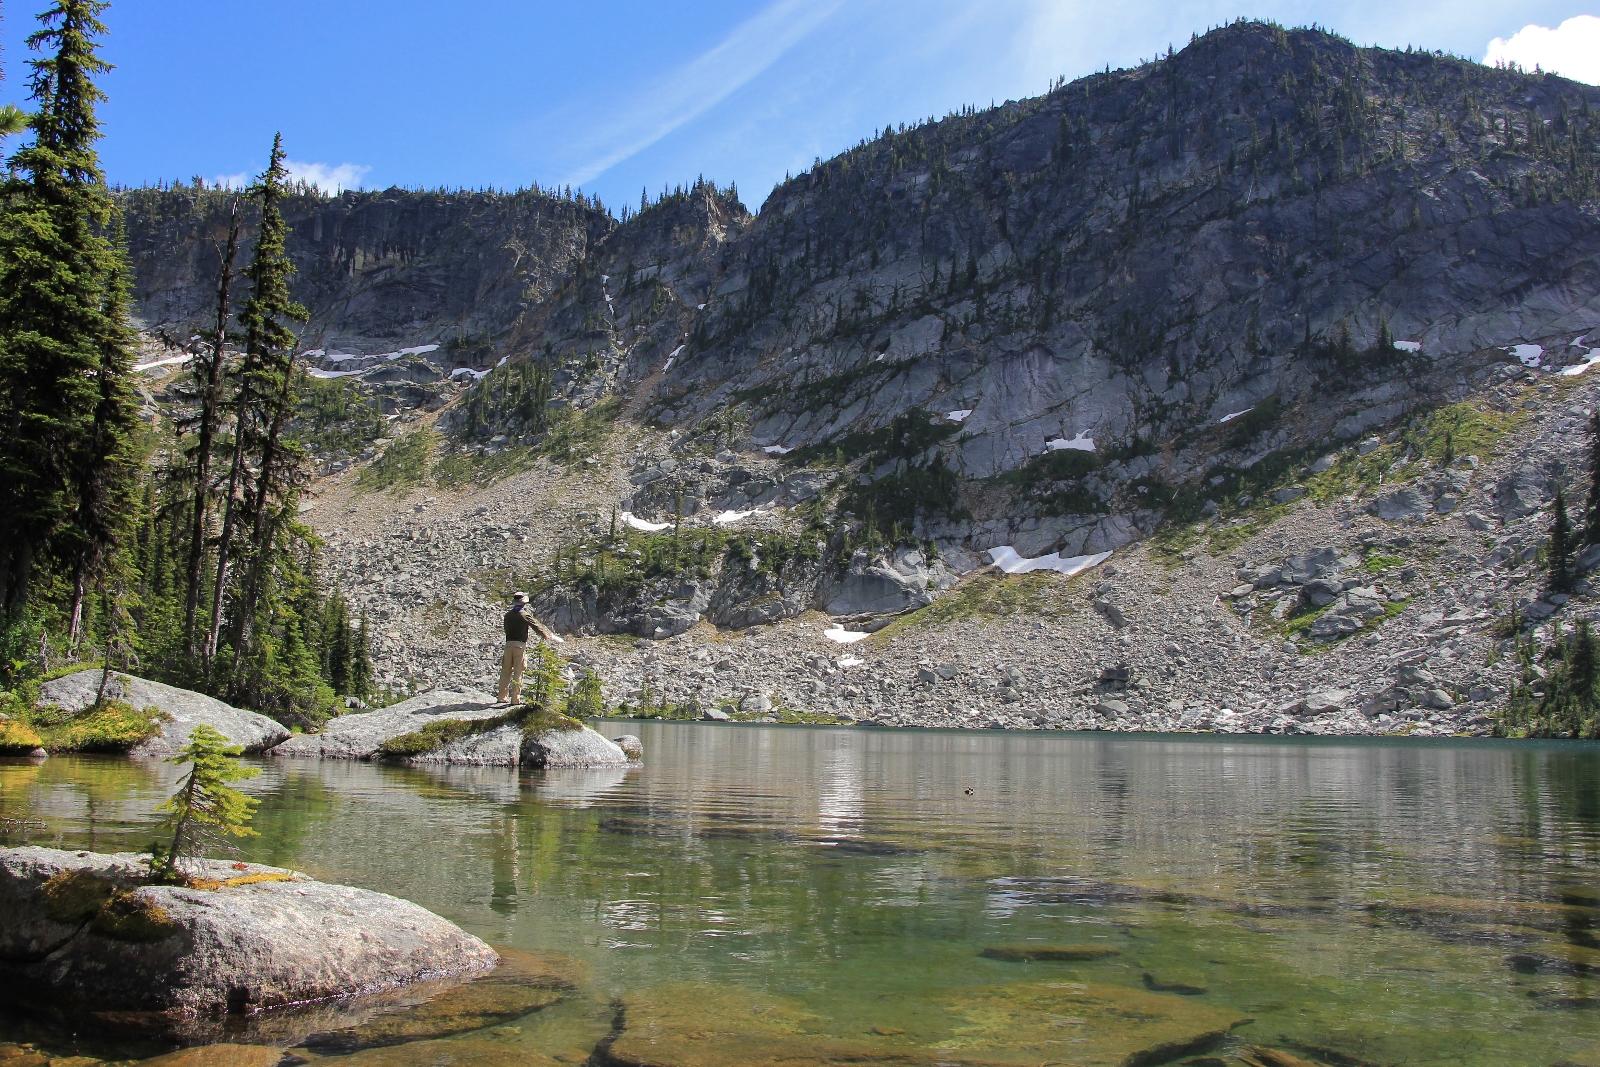 07-23-16-big-fisher-lake-bp-79